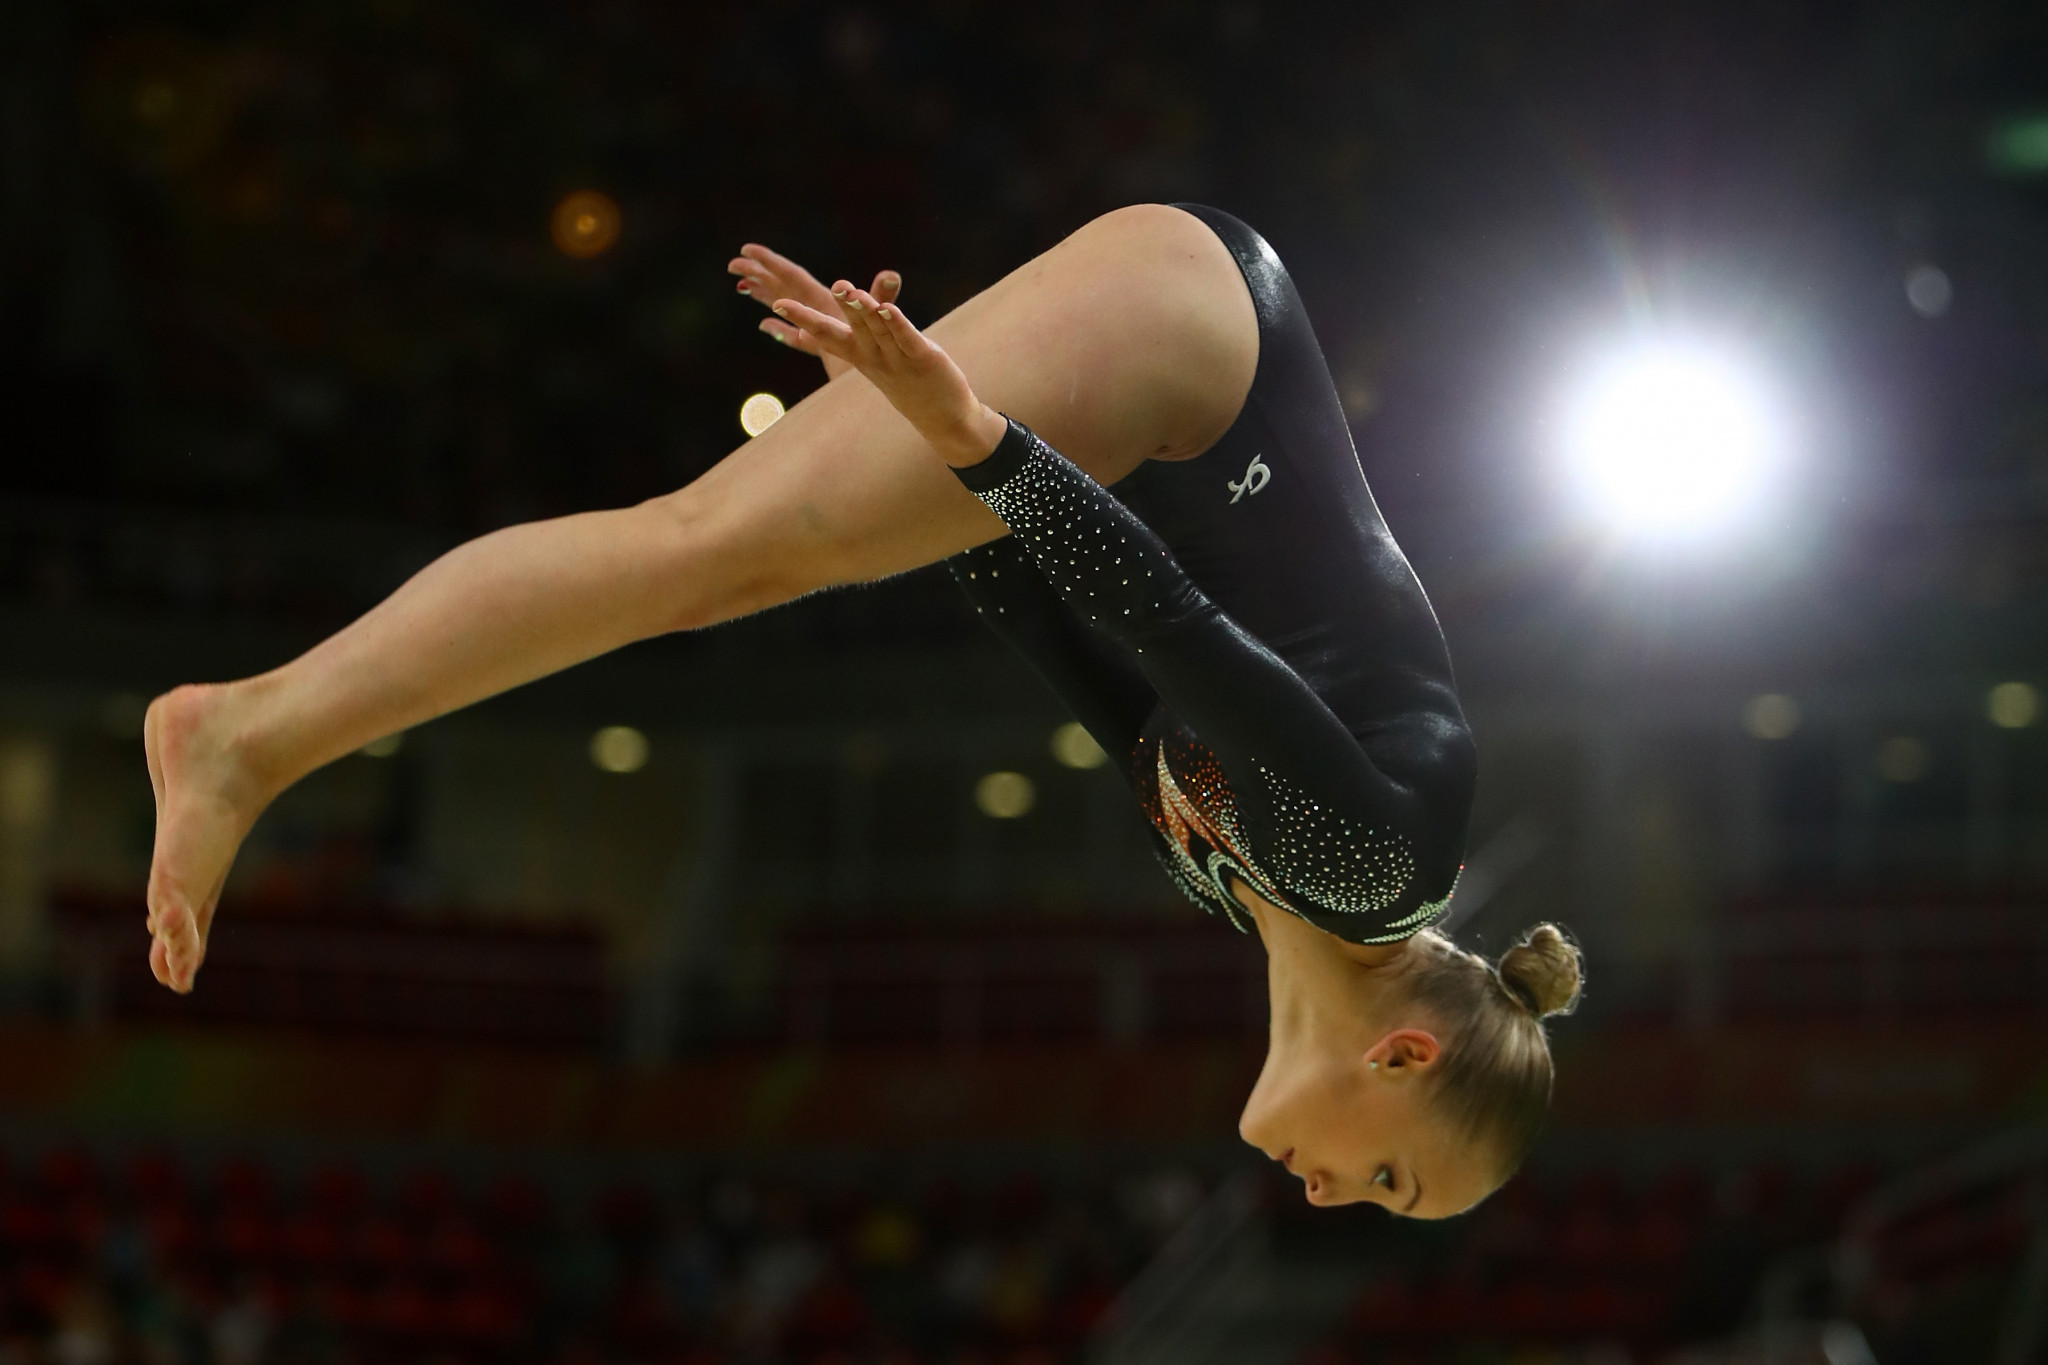 Olympic champions progress at FIG Individual Apparatus World Cup